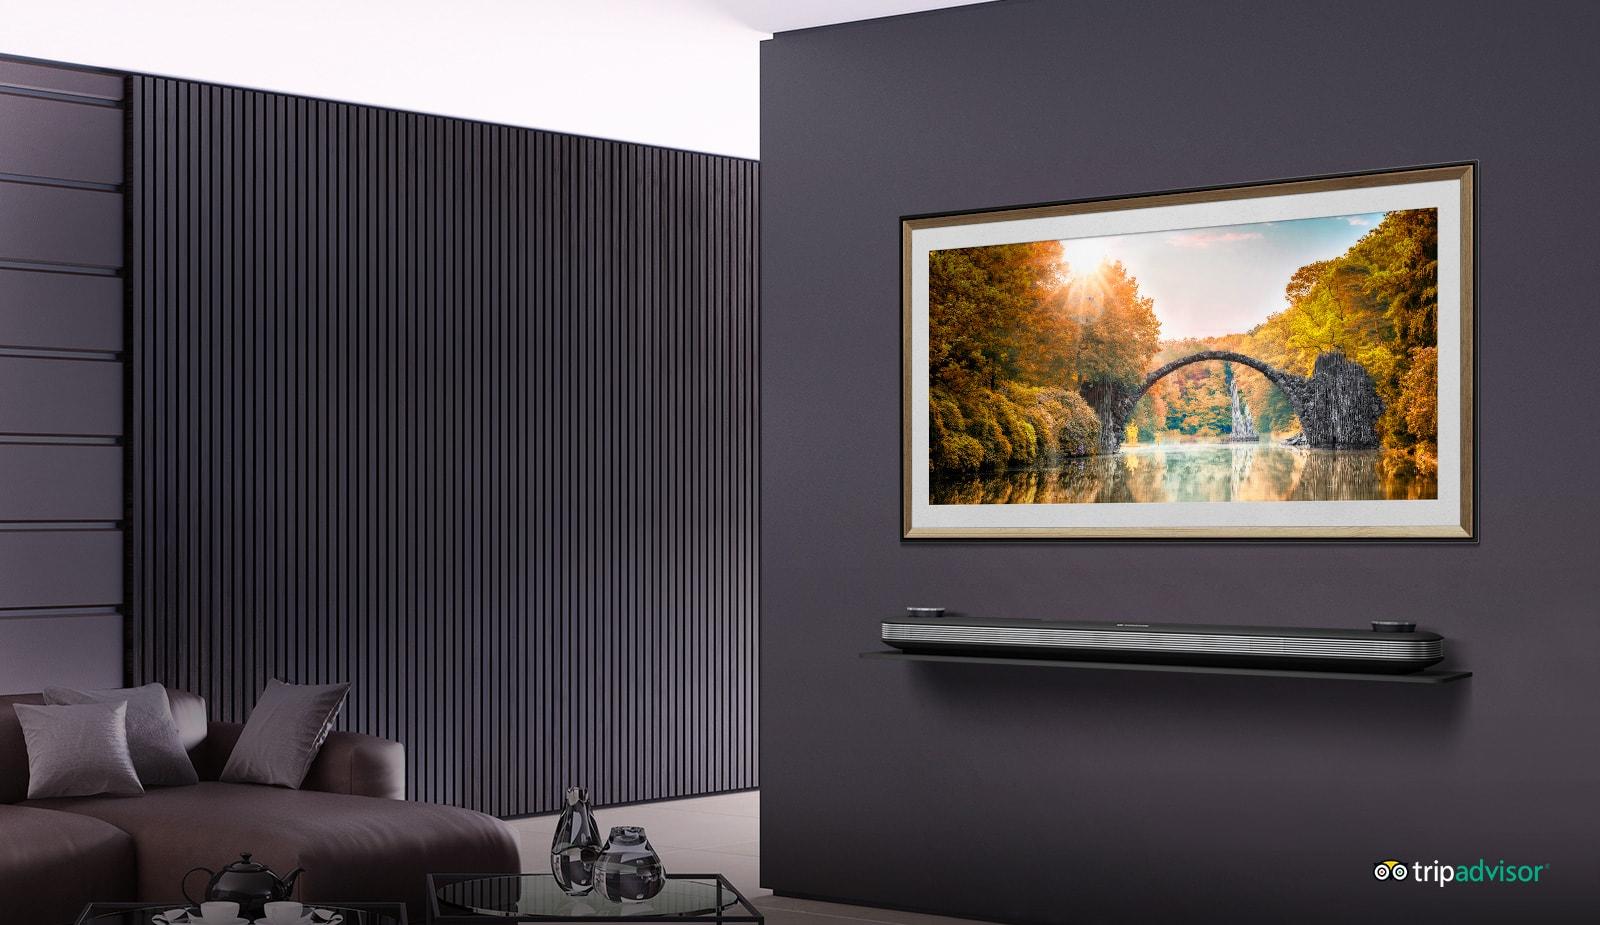 TV-SIGNATURE-OLED-W9-07-Gallery-Mode-Desktop